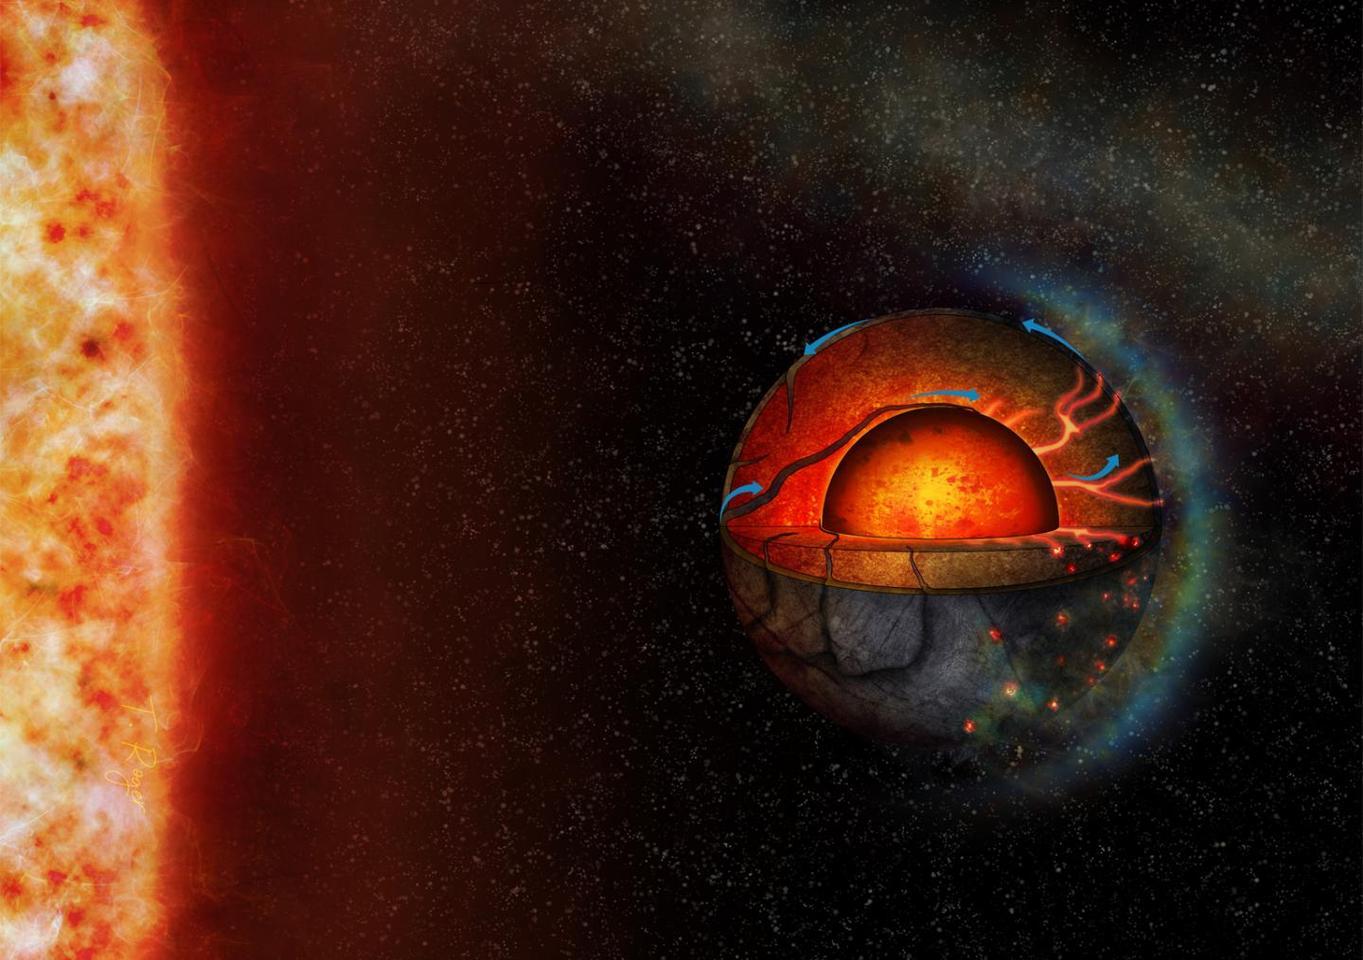 Artist's impression of exoplanet LHS 3844b